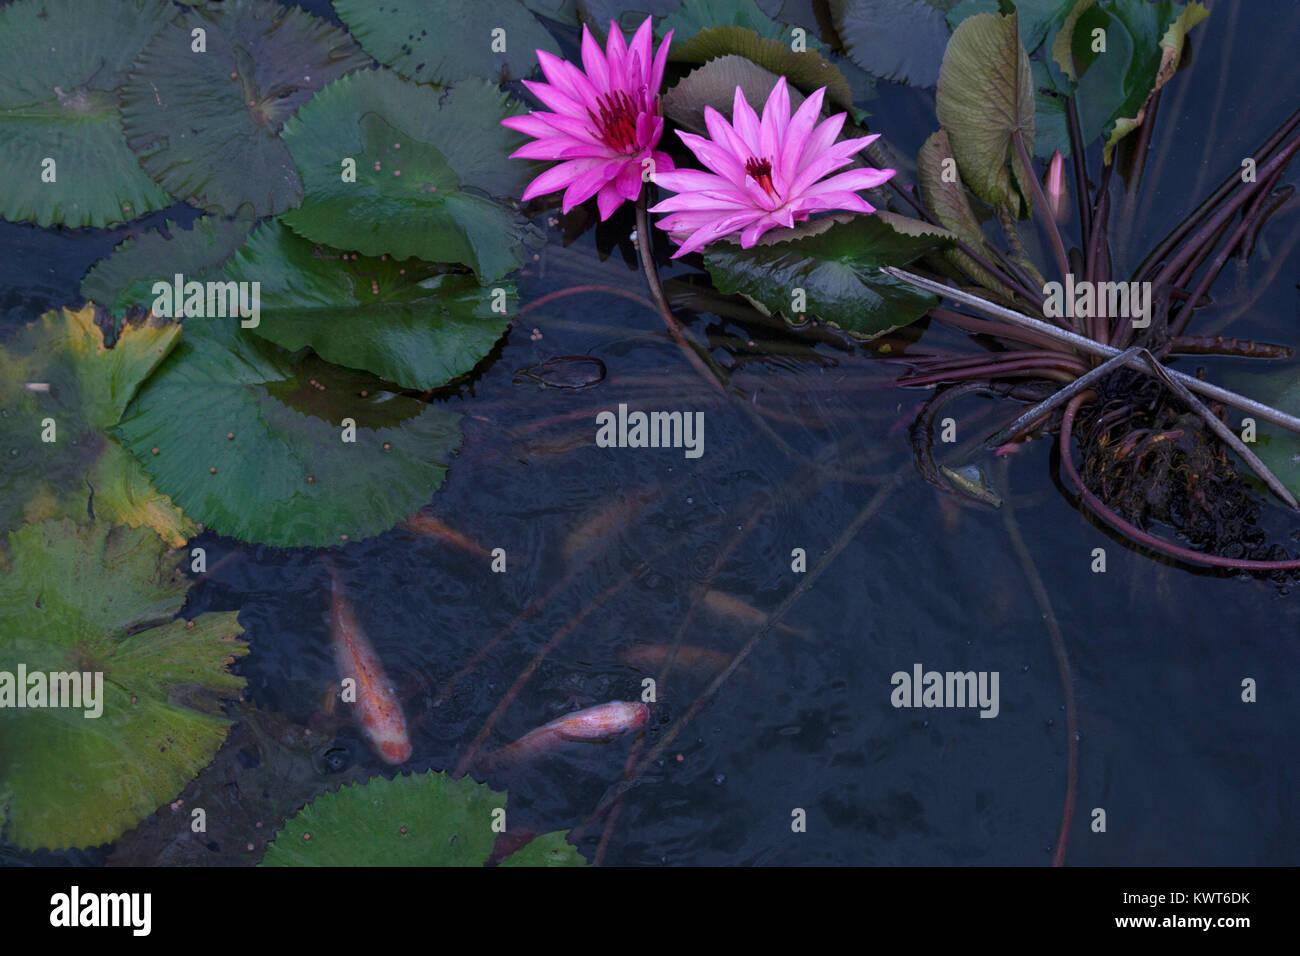 Goldfish In The Pond Lotus Flower Stock Photo 170791647 Alamy